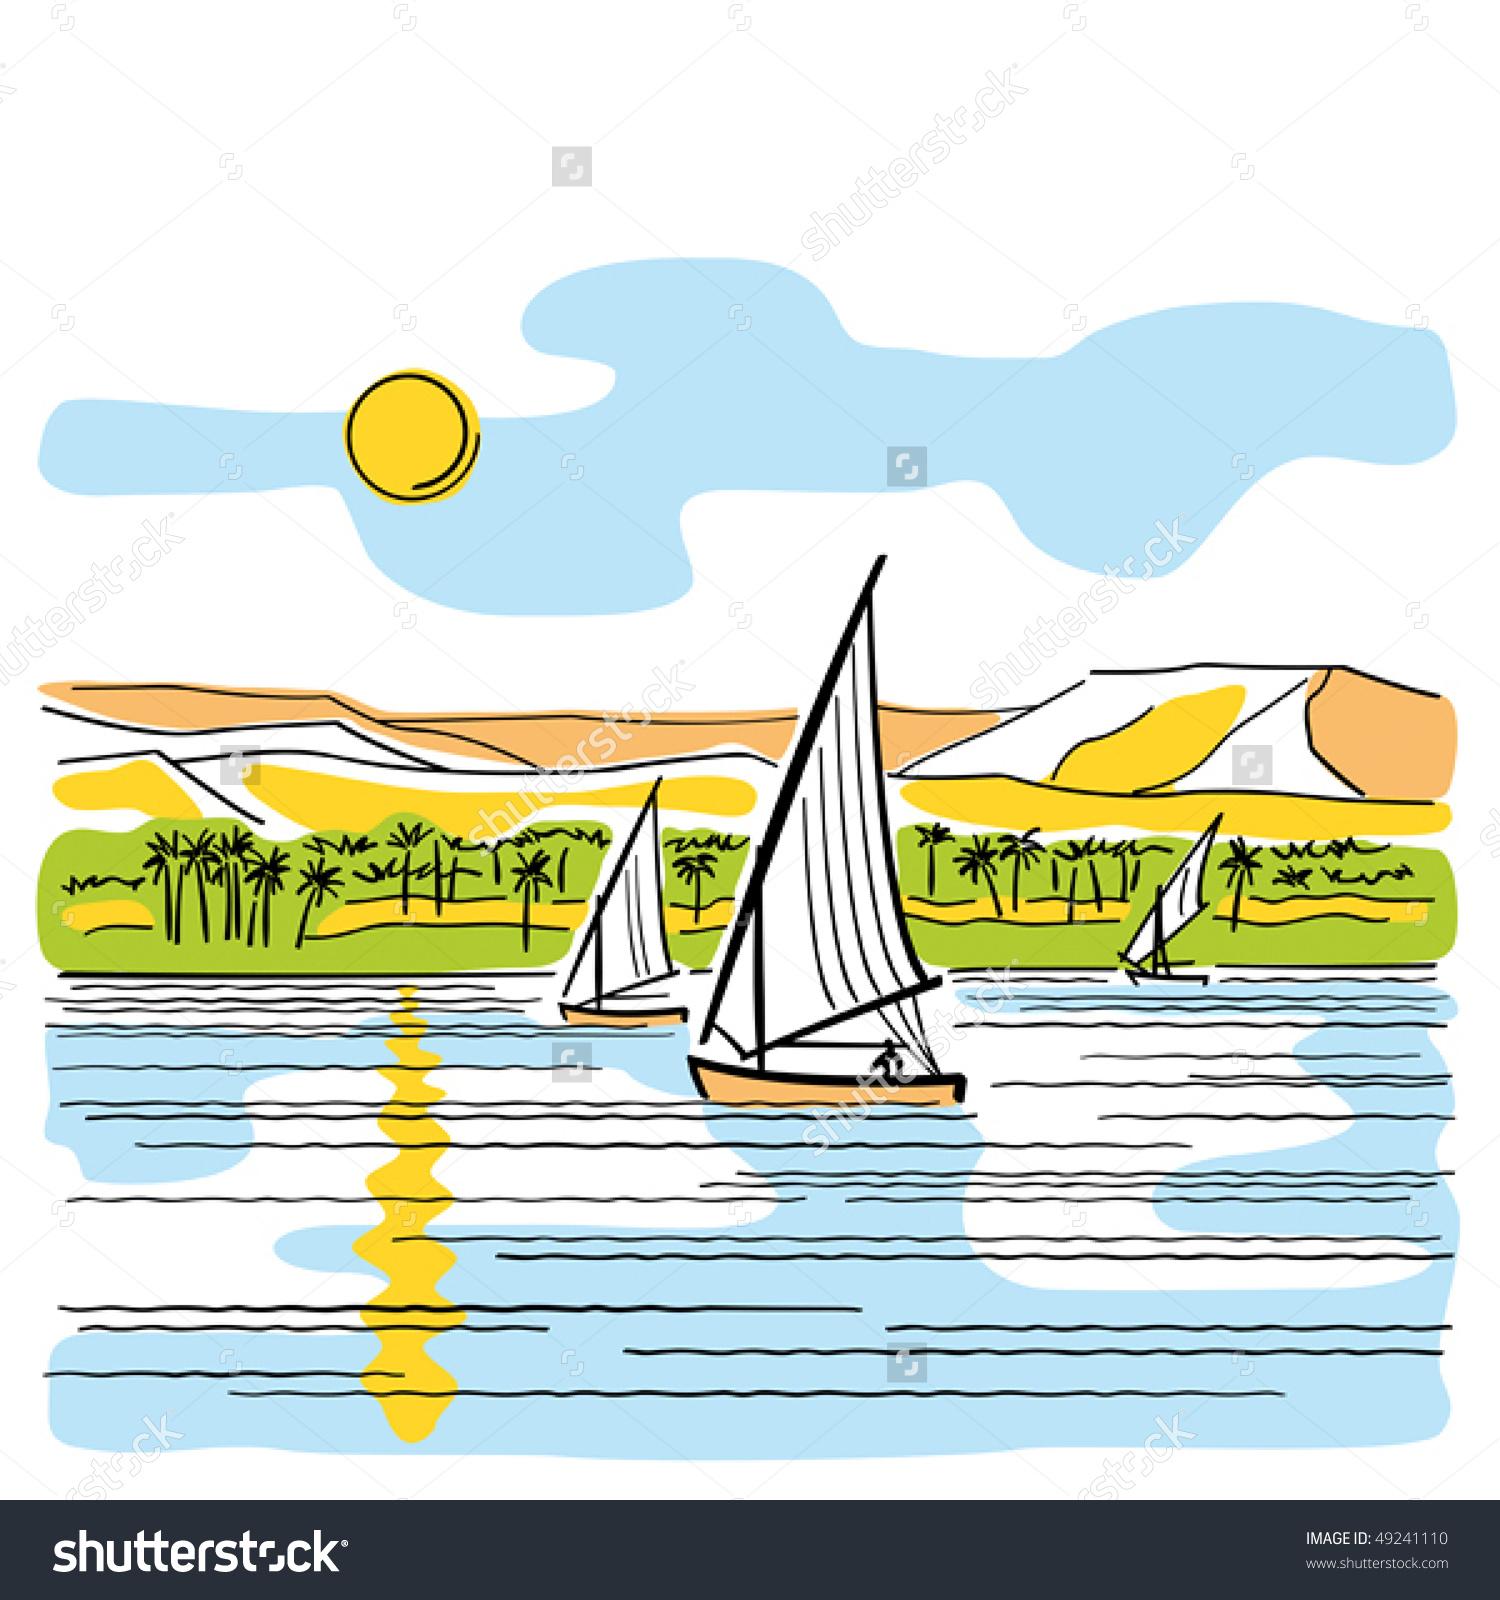 Clipart nile river image stock River Nile Egypt Vector Stock Vector 49241110 - Shutterstock image stock